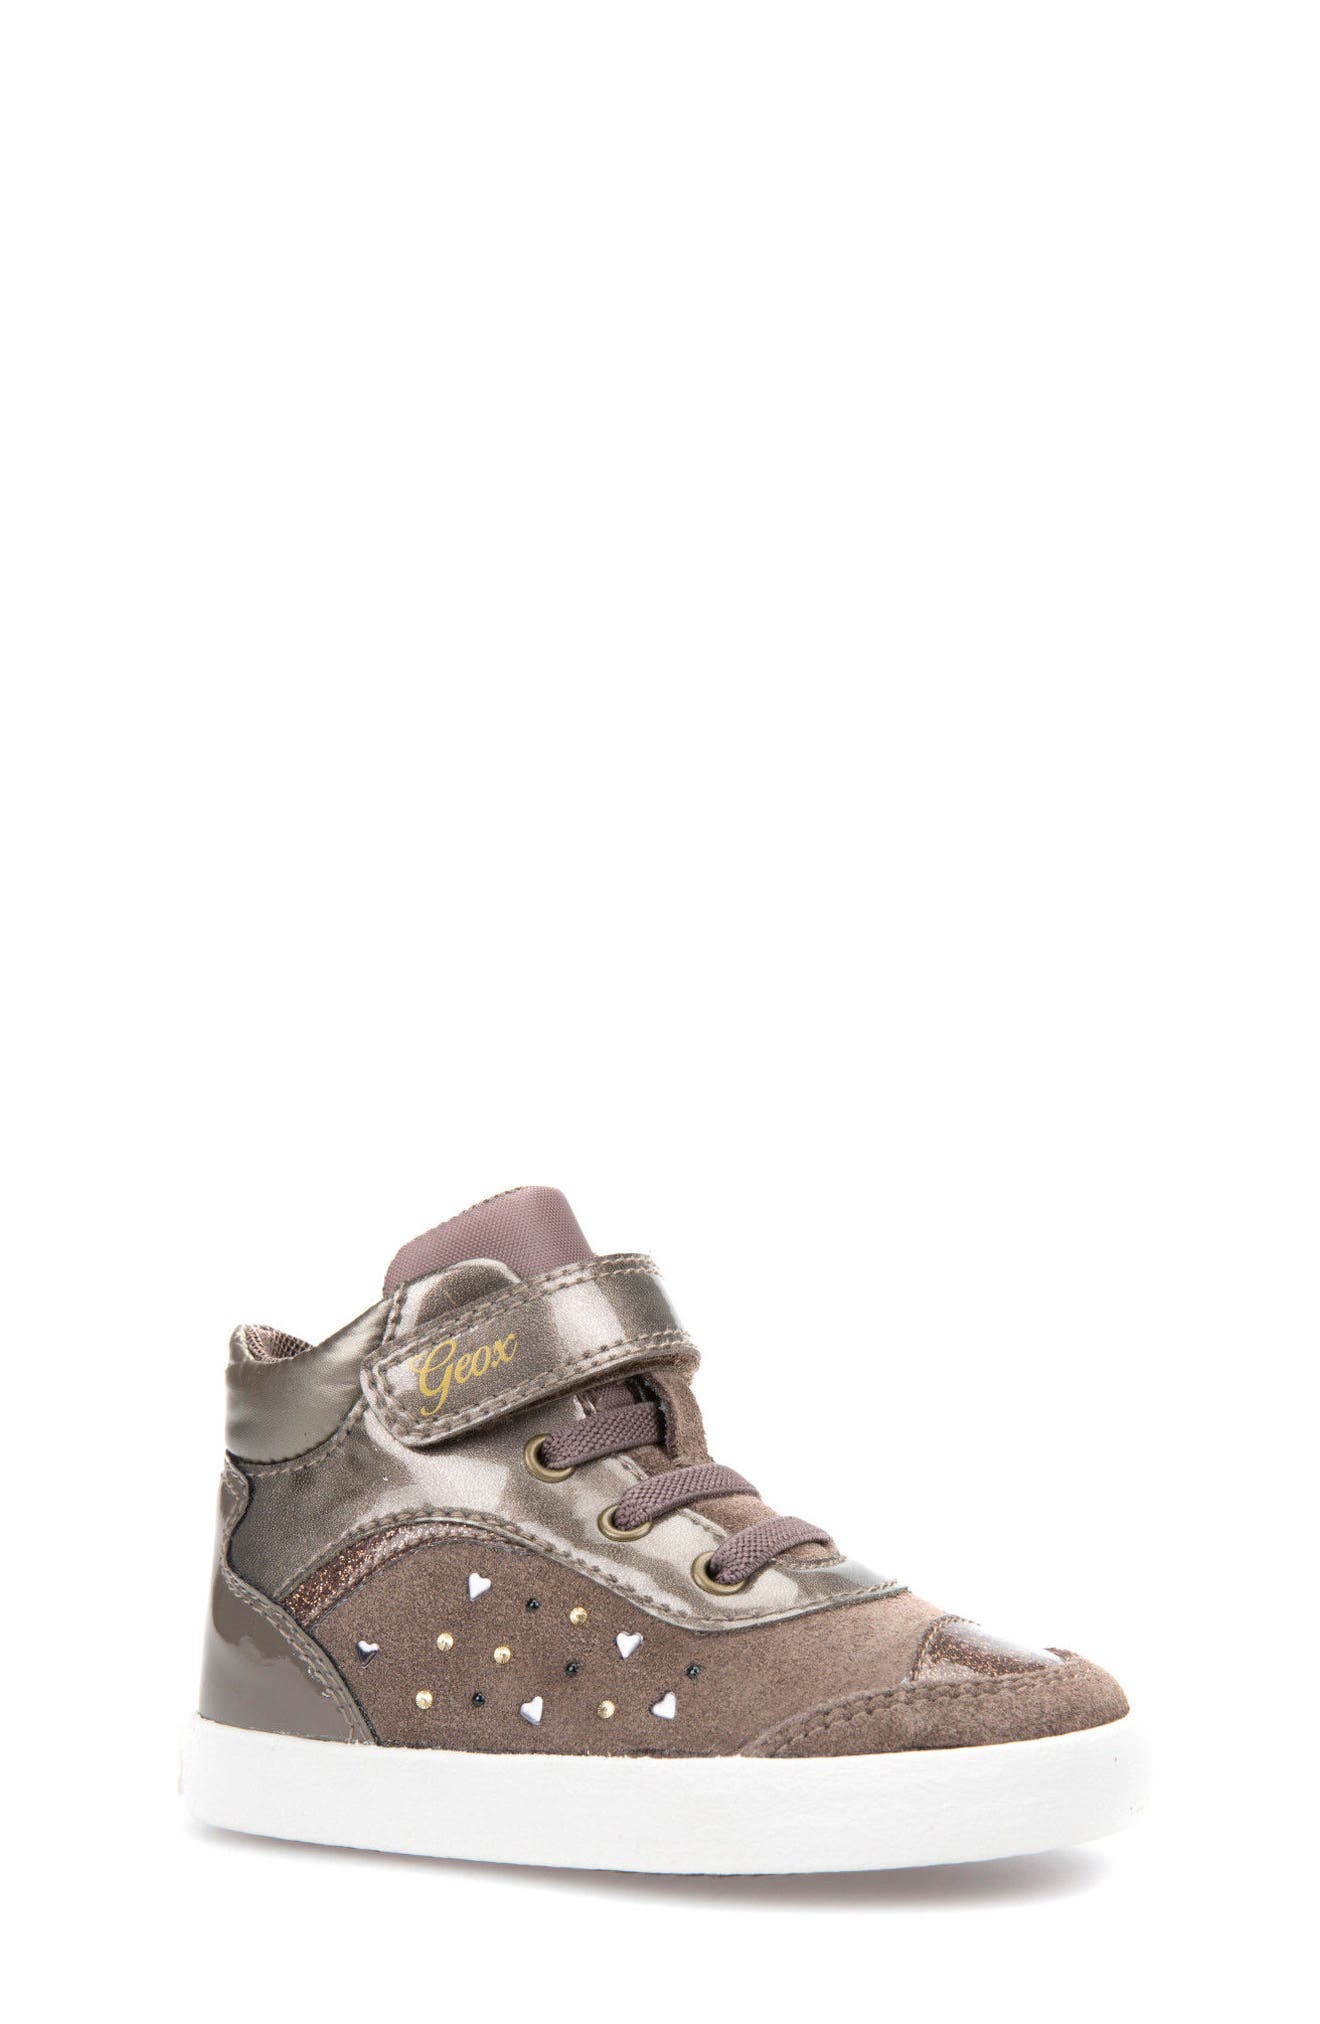 Kiwi Girl Studded High Top Sneaker,                             Main thumbnail 3, color,